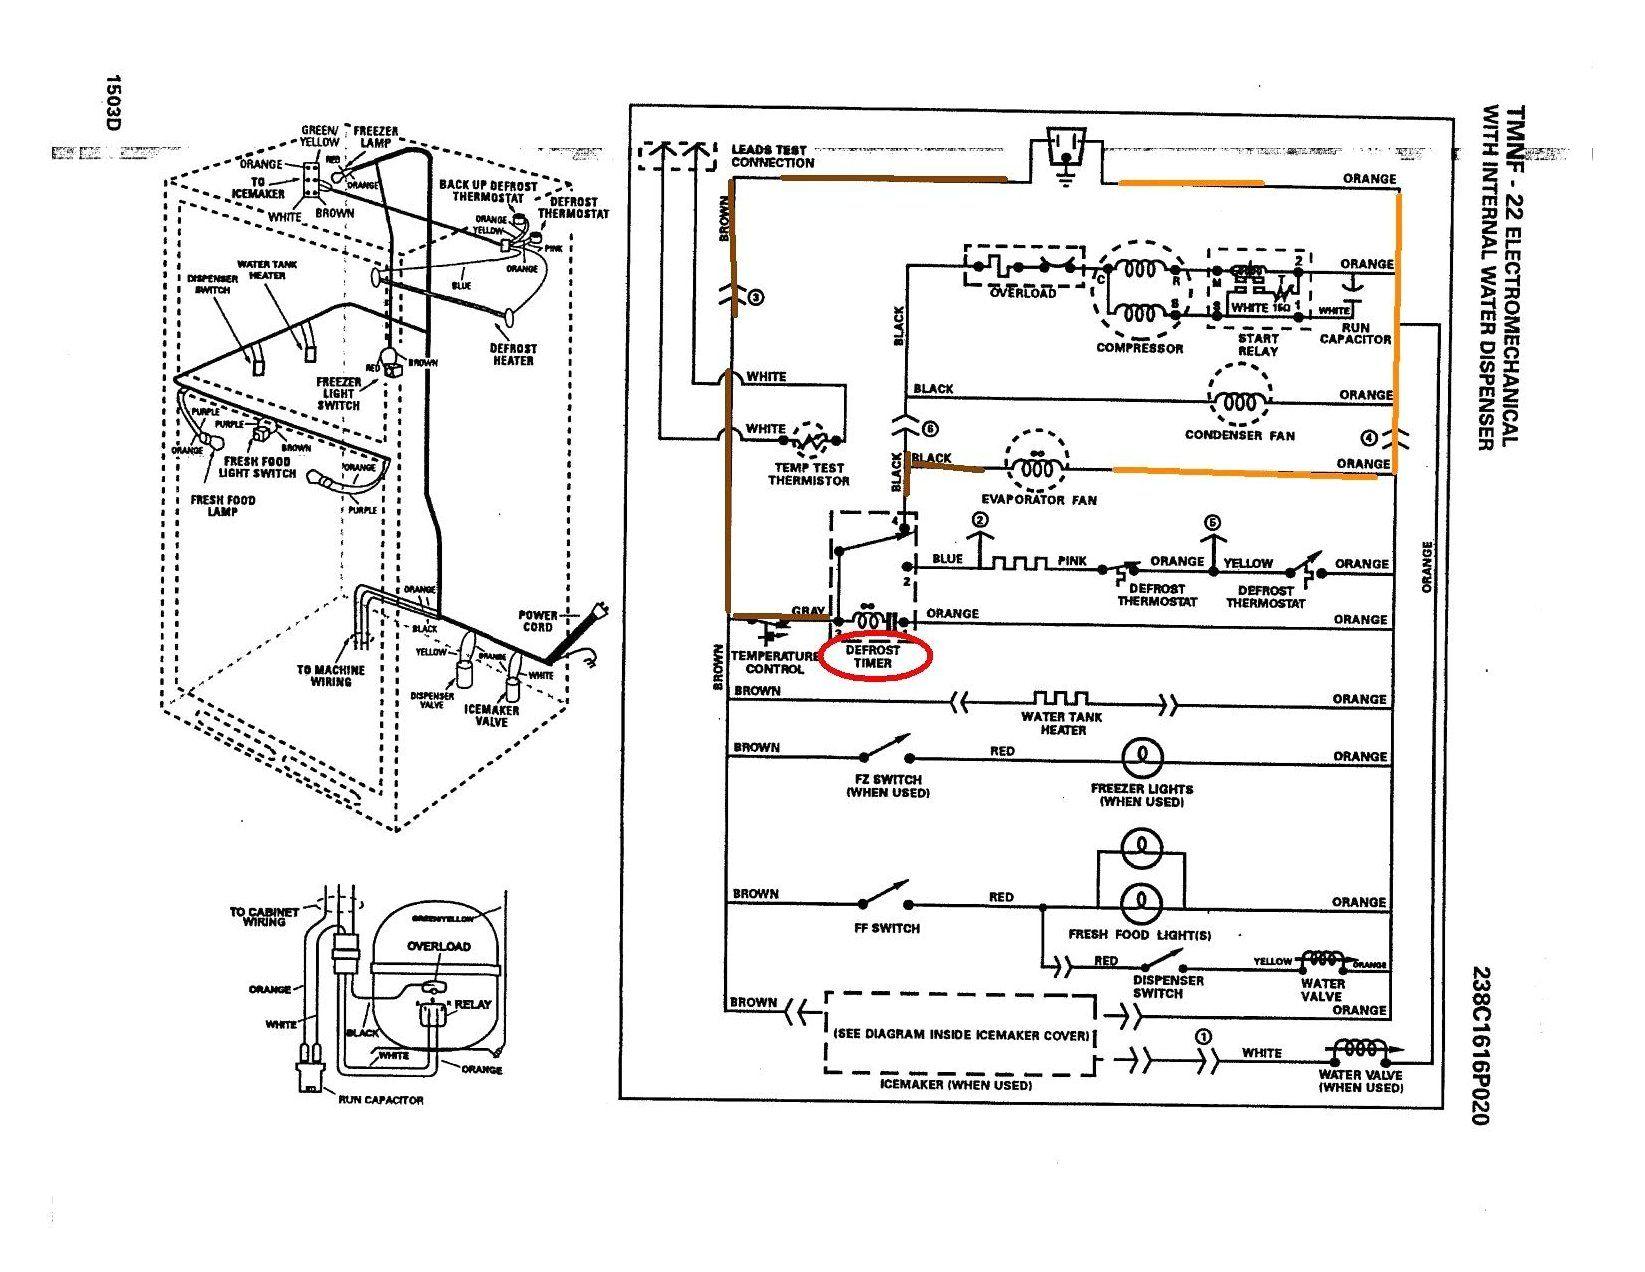 Wiring Diagram Symbols Double Door Fridge Wiring Diagram Doubledoorfridgewiringdiagram Whe Refrigerator Compressor Trailer Wiring Diagram Ge Refrigerator